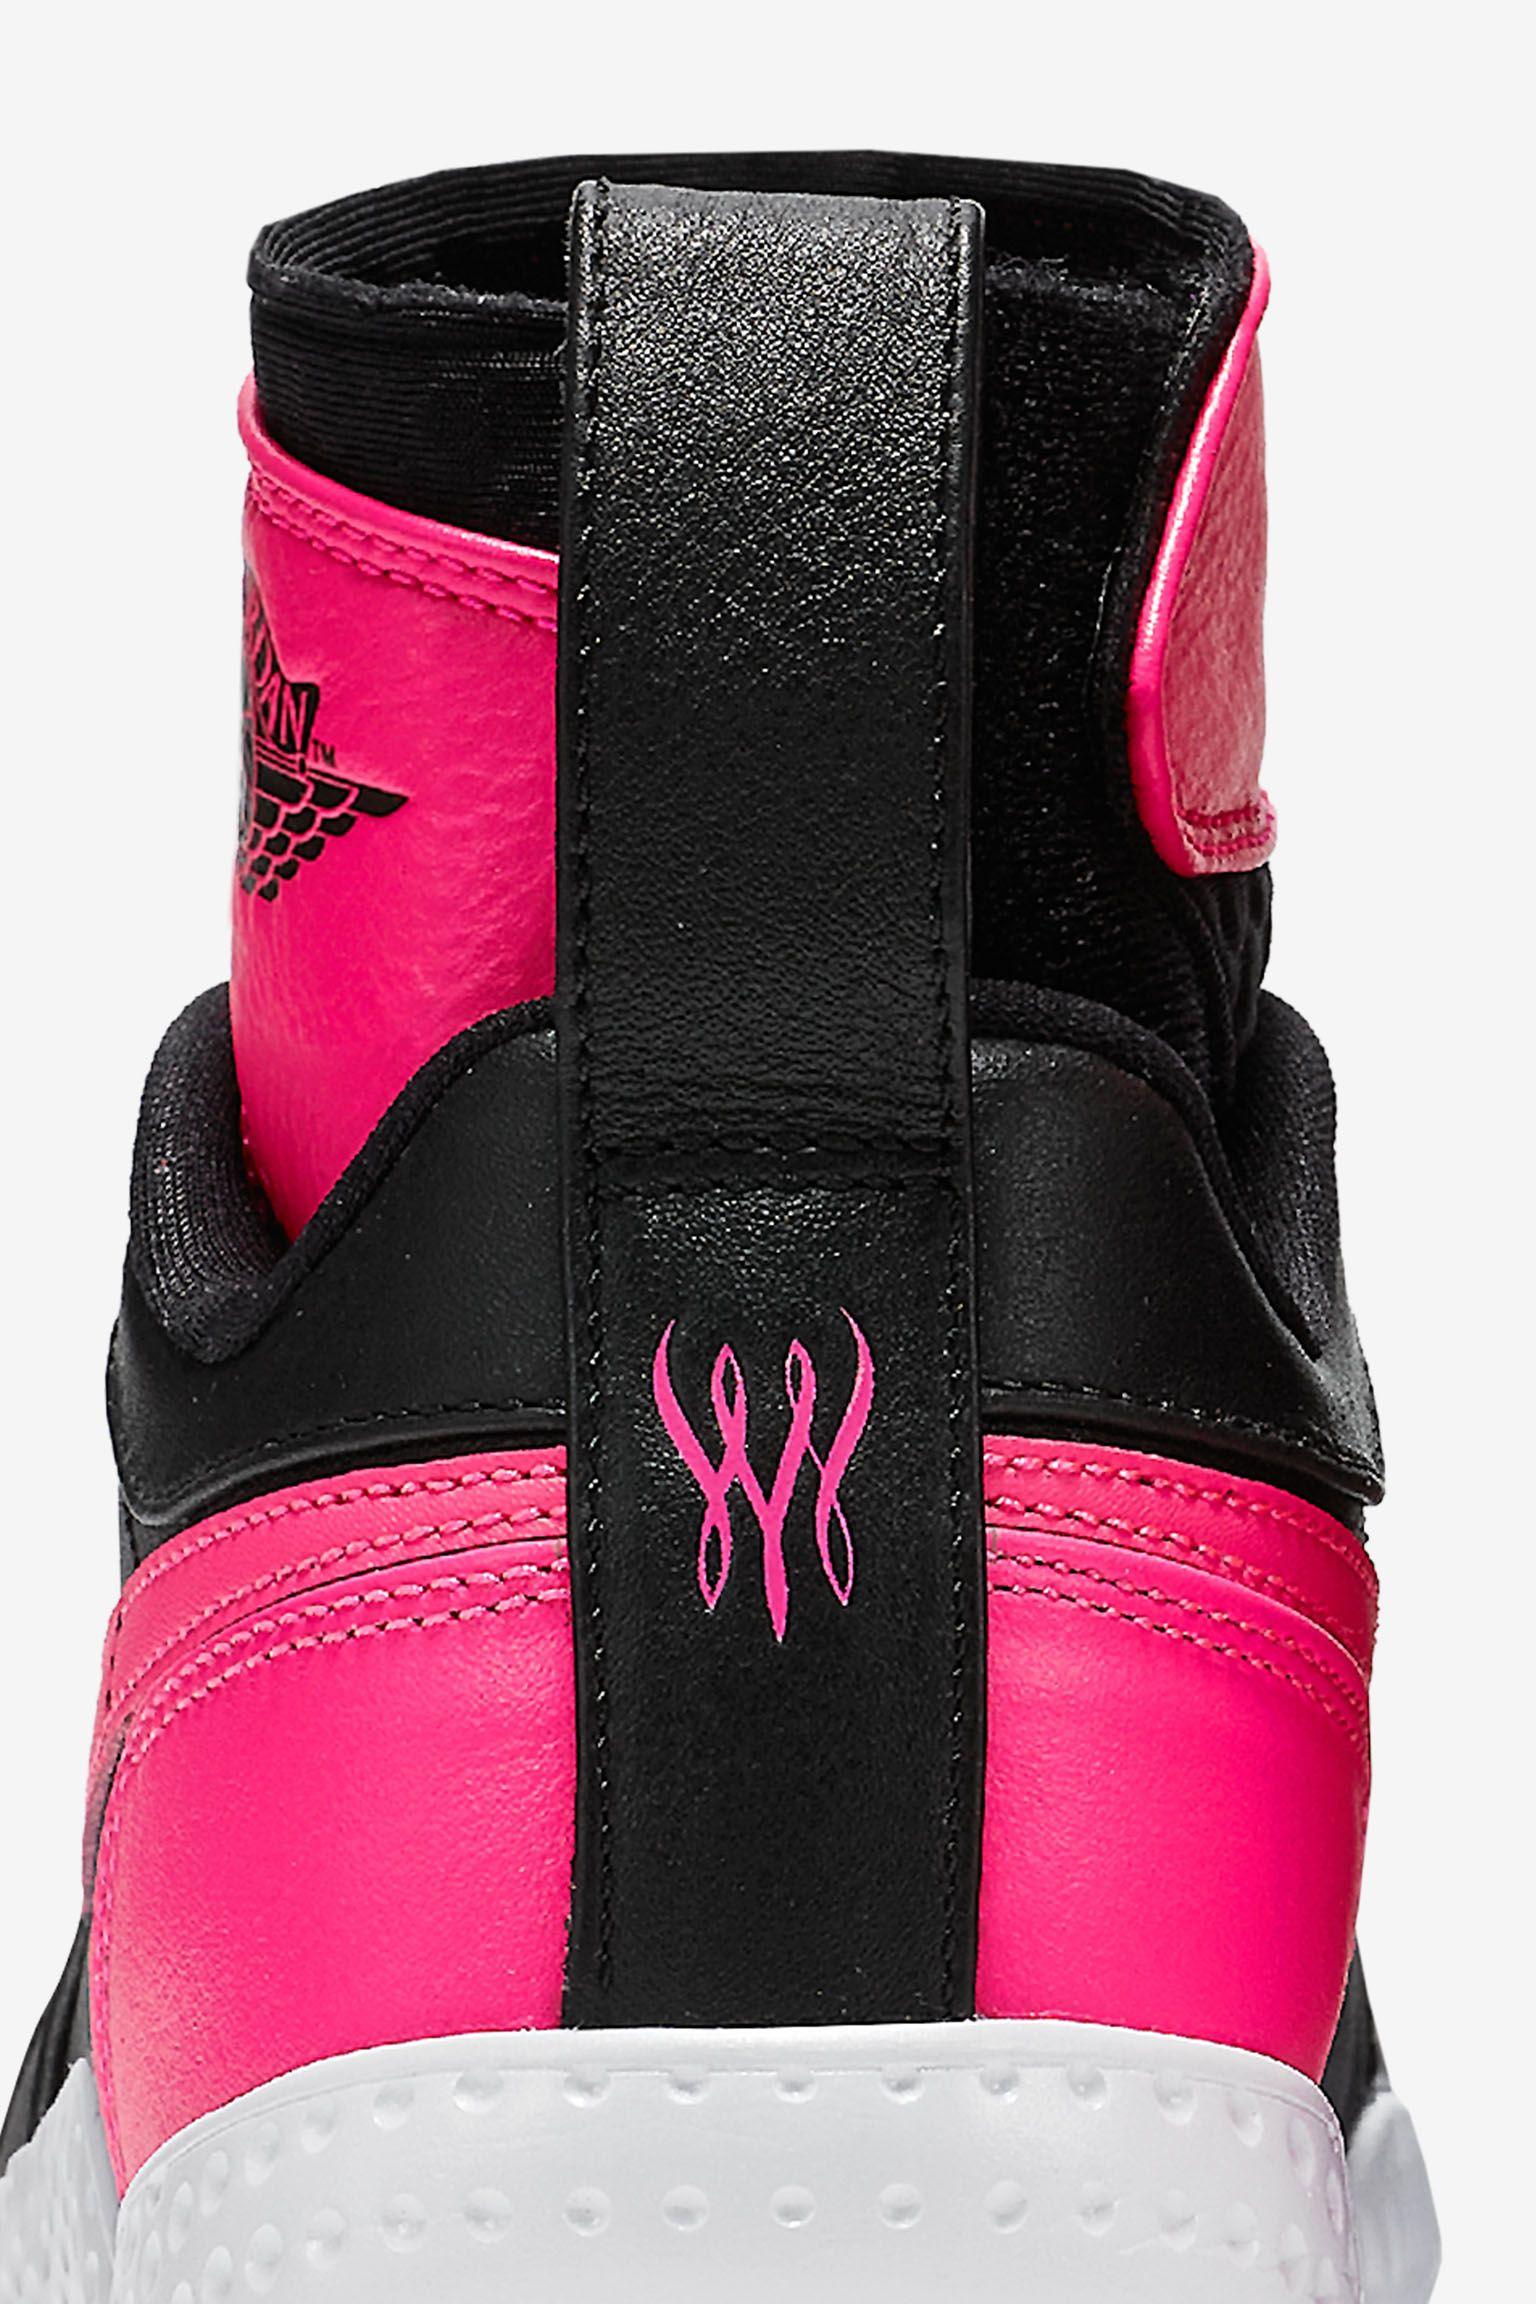 NikeCourt Flare AJ1 « Black & Hyper Pink » pour Femme